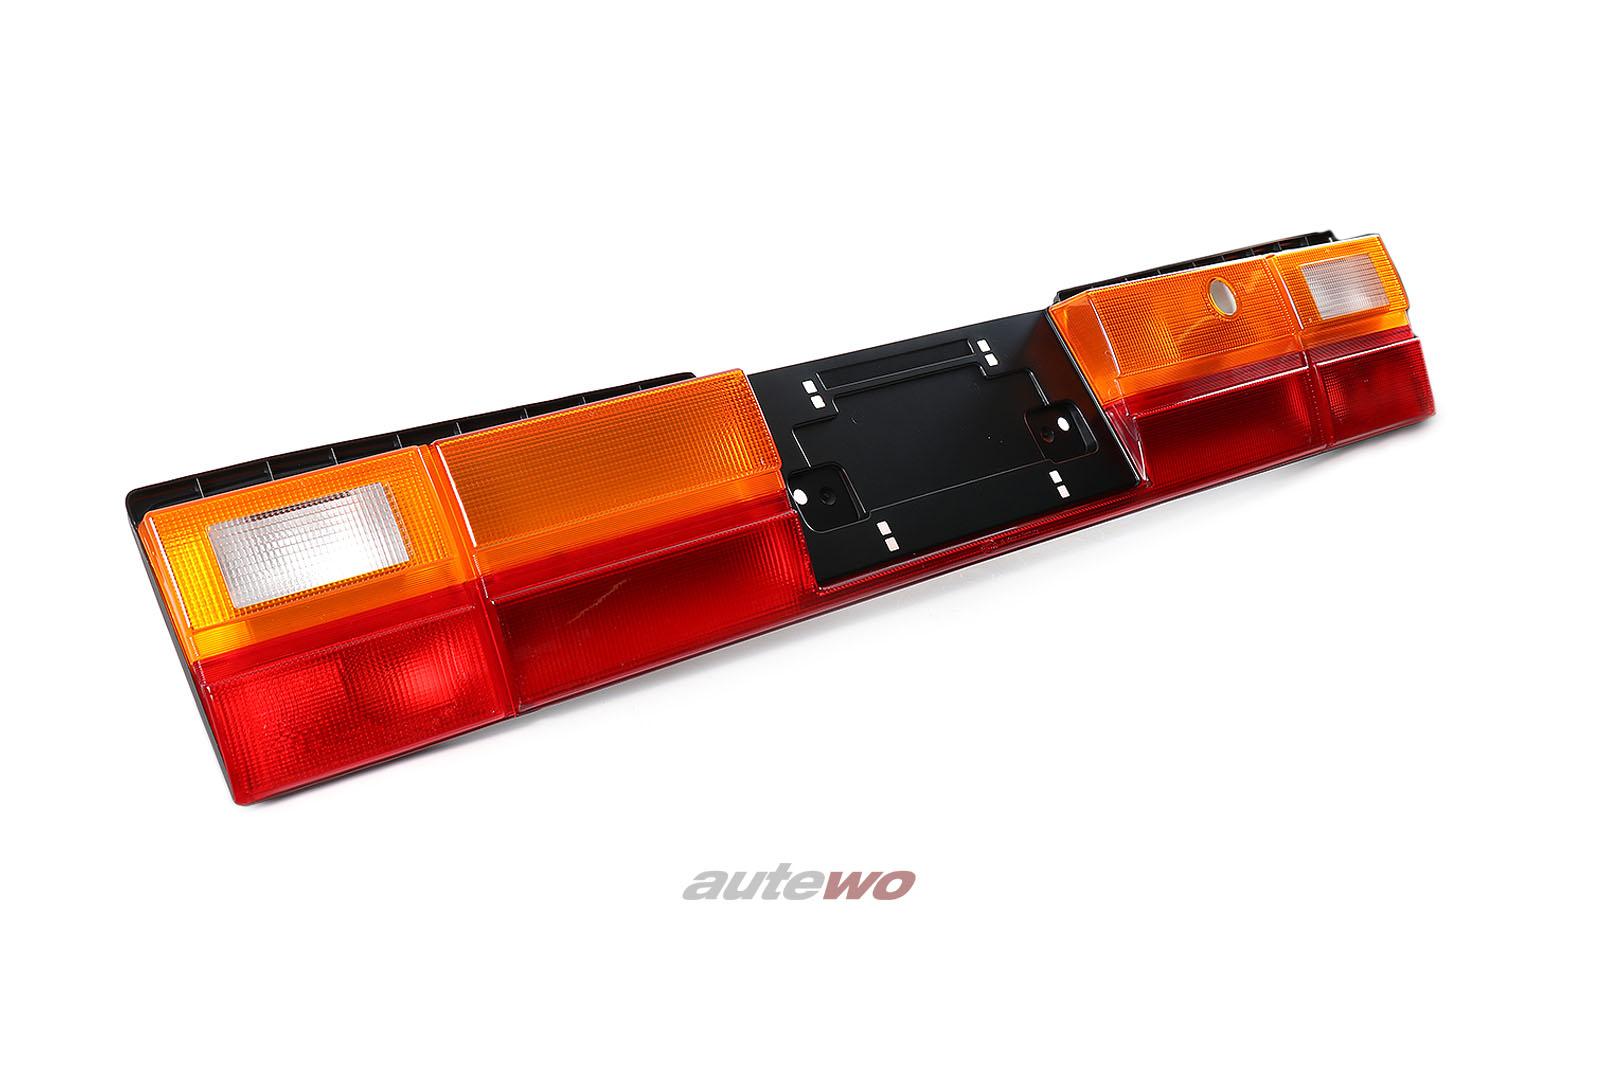 447945695N NEU Audi 100/200 Typ 44 Limousine Rückleuchtenband US-Version